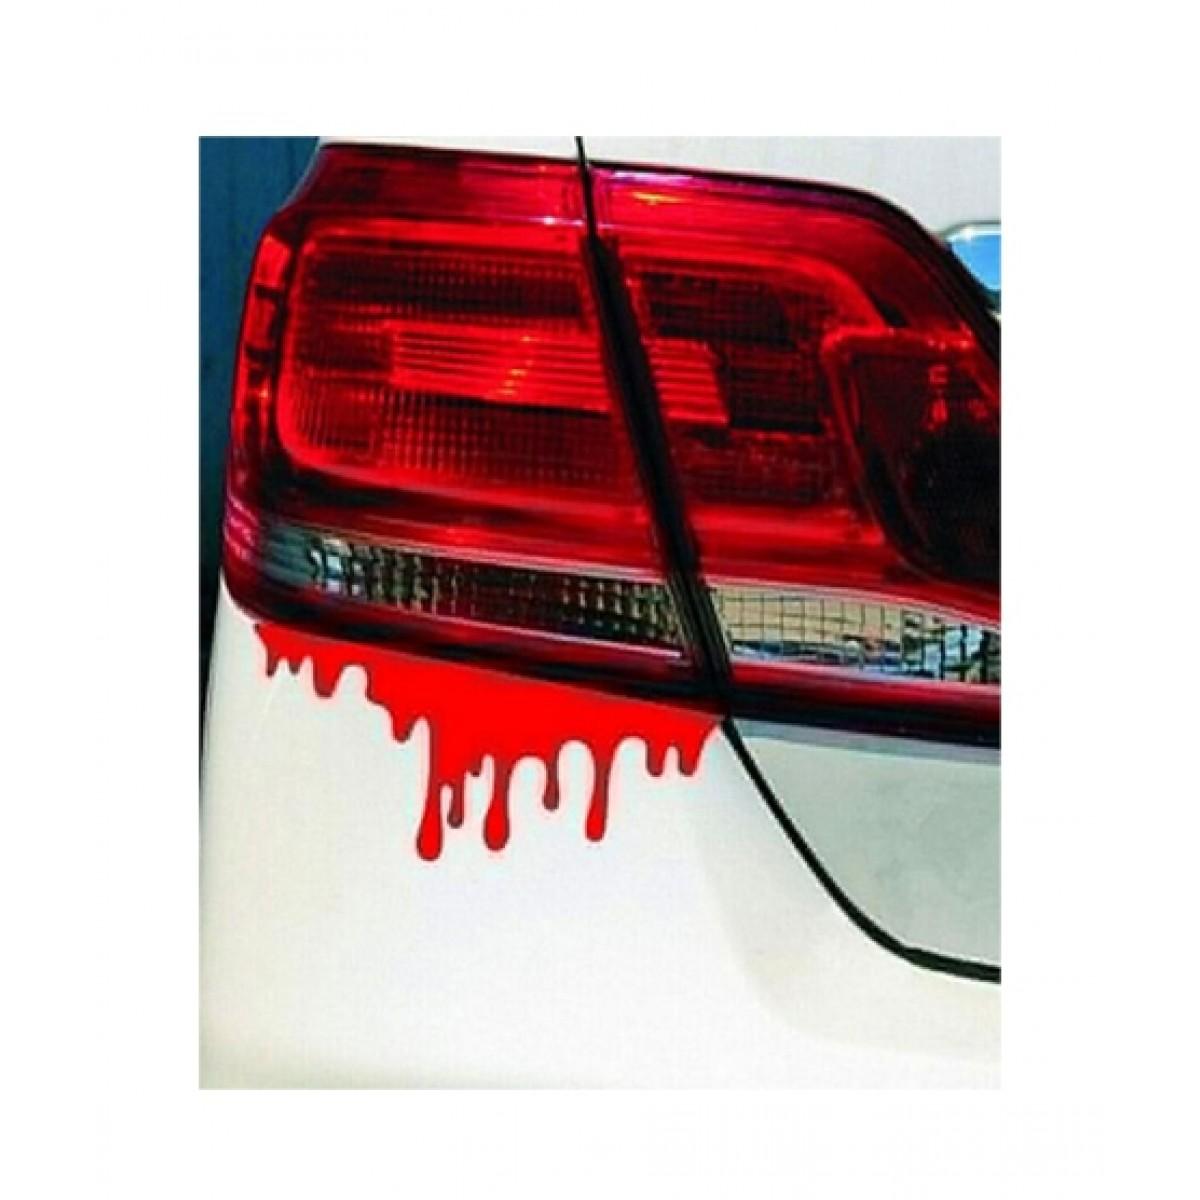 Wish hub blood car light bumper sticker price in pakistan buy wish hub red blood car bumper sticker ishopping pk